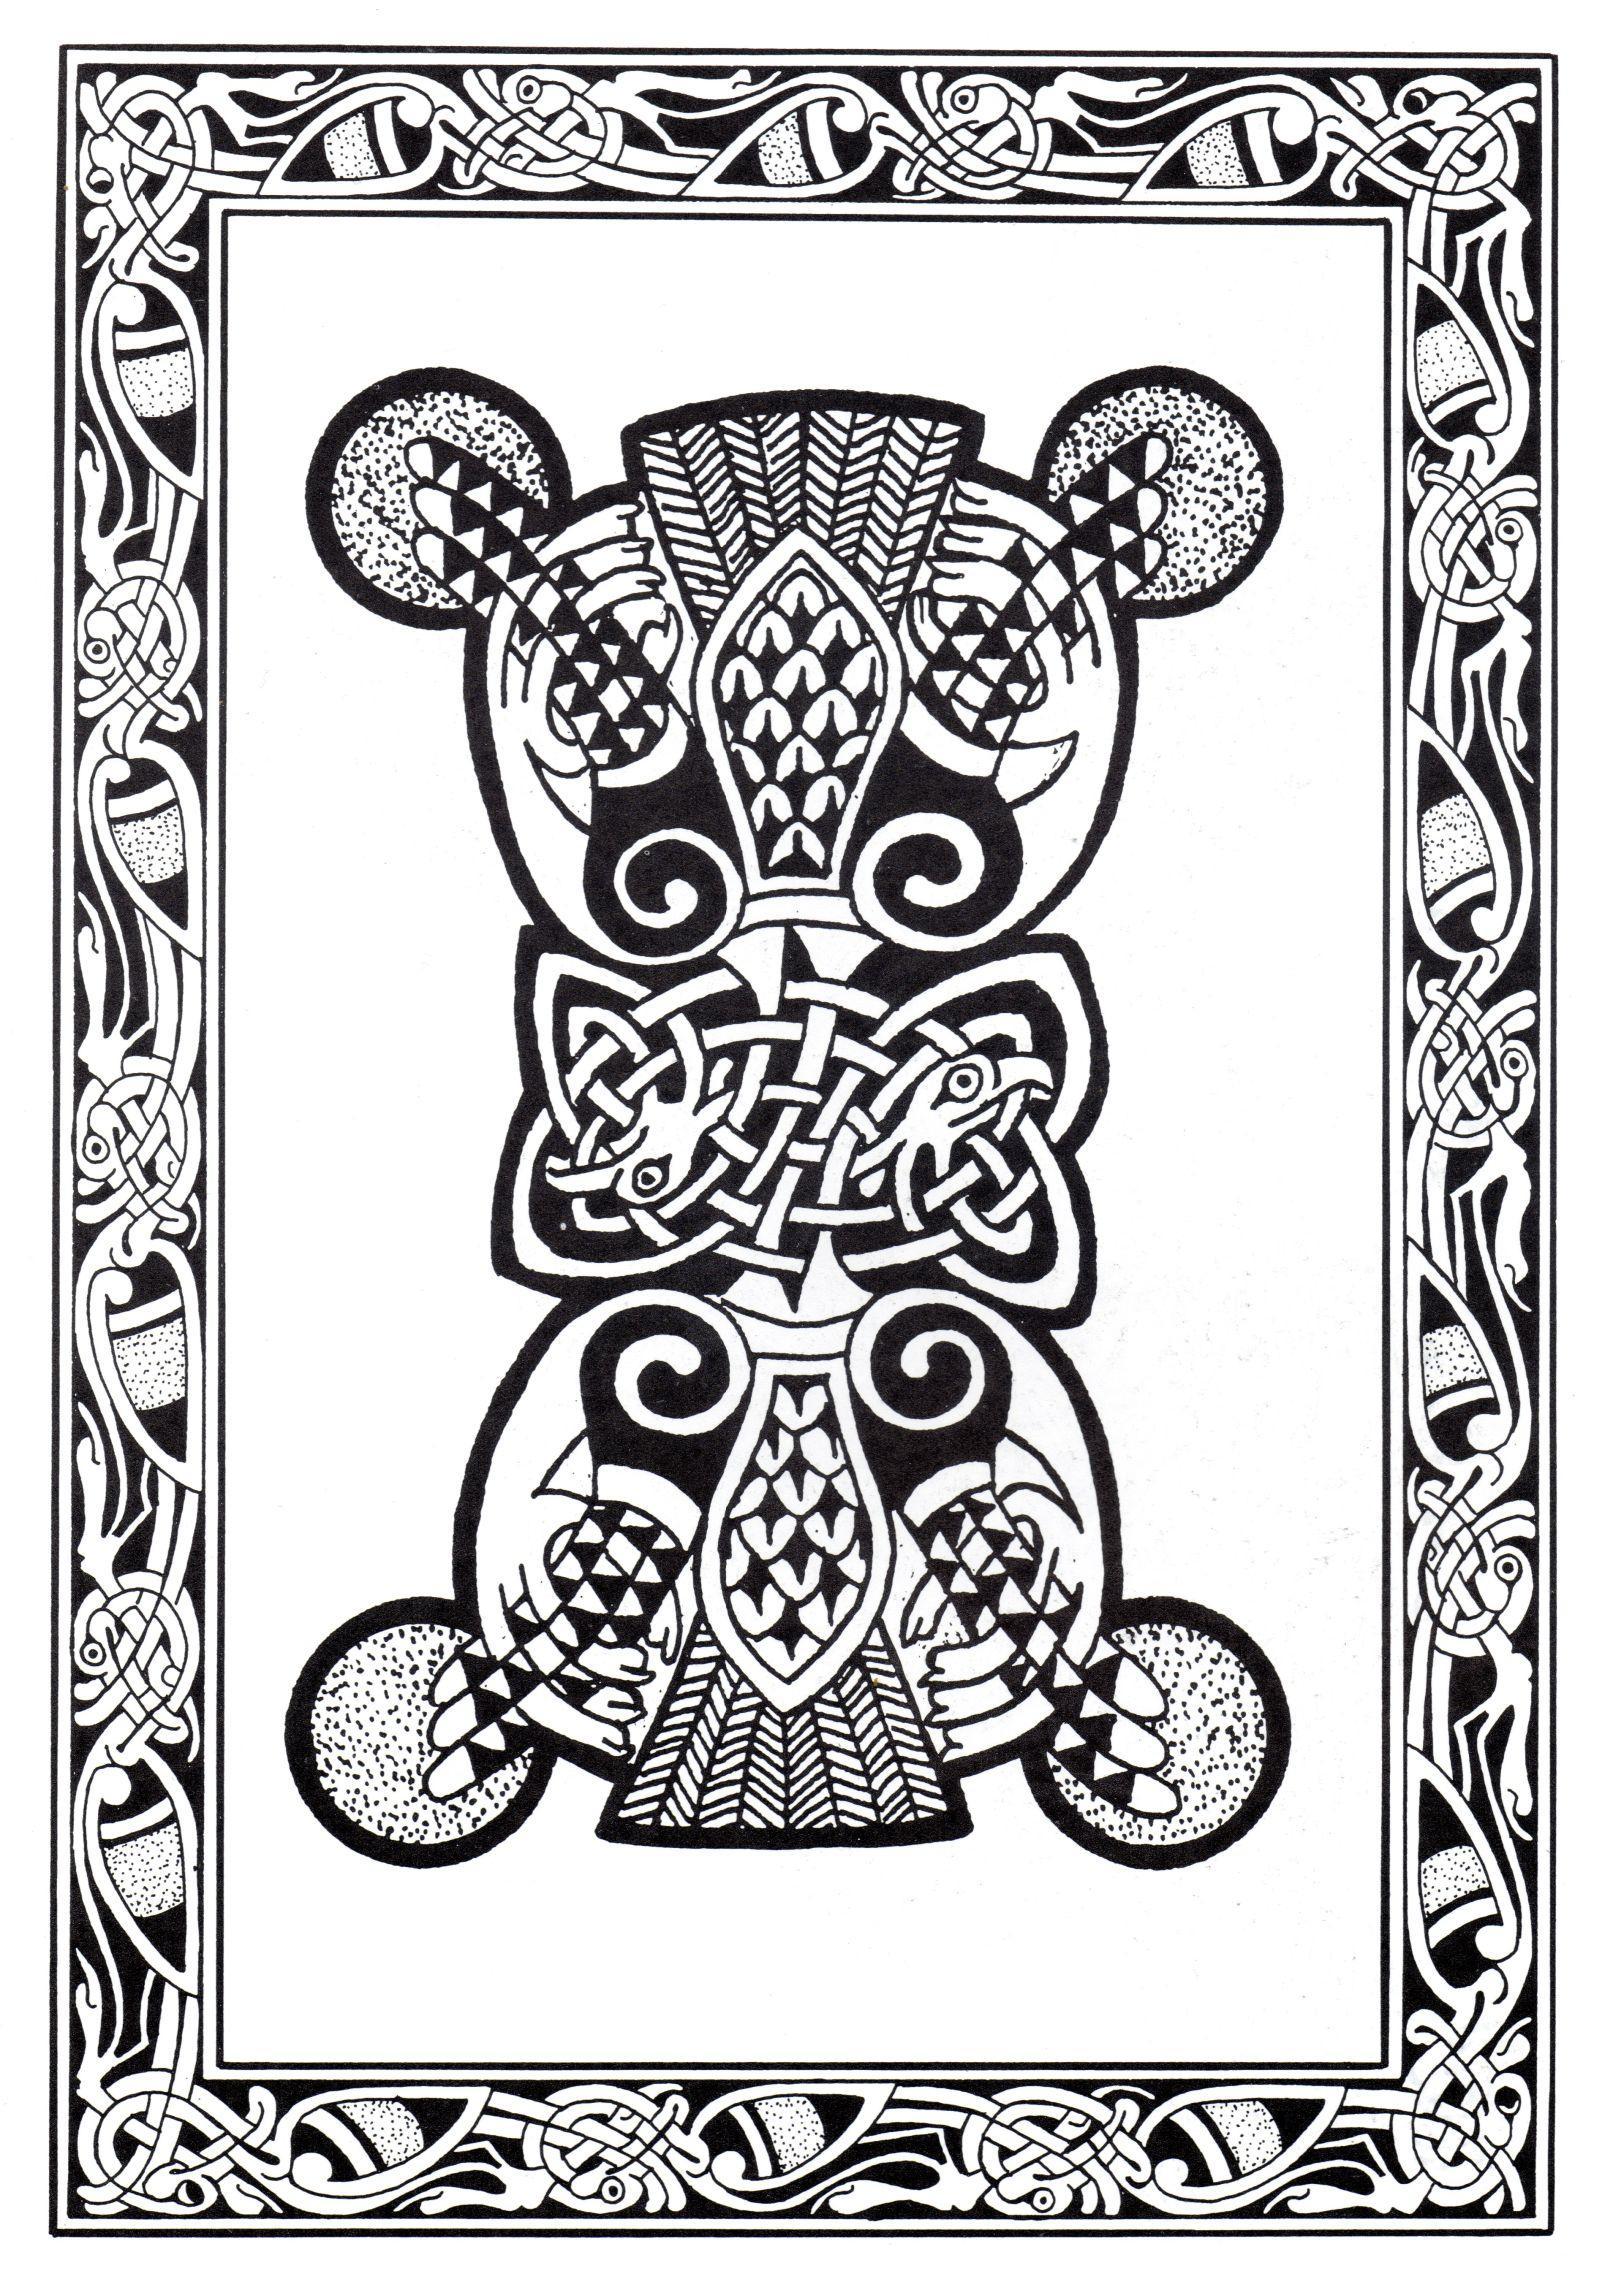 Complex abstract Celtic art design